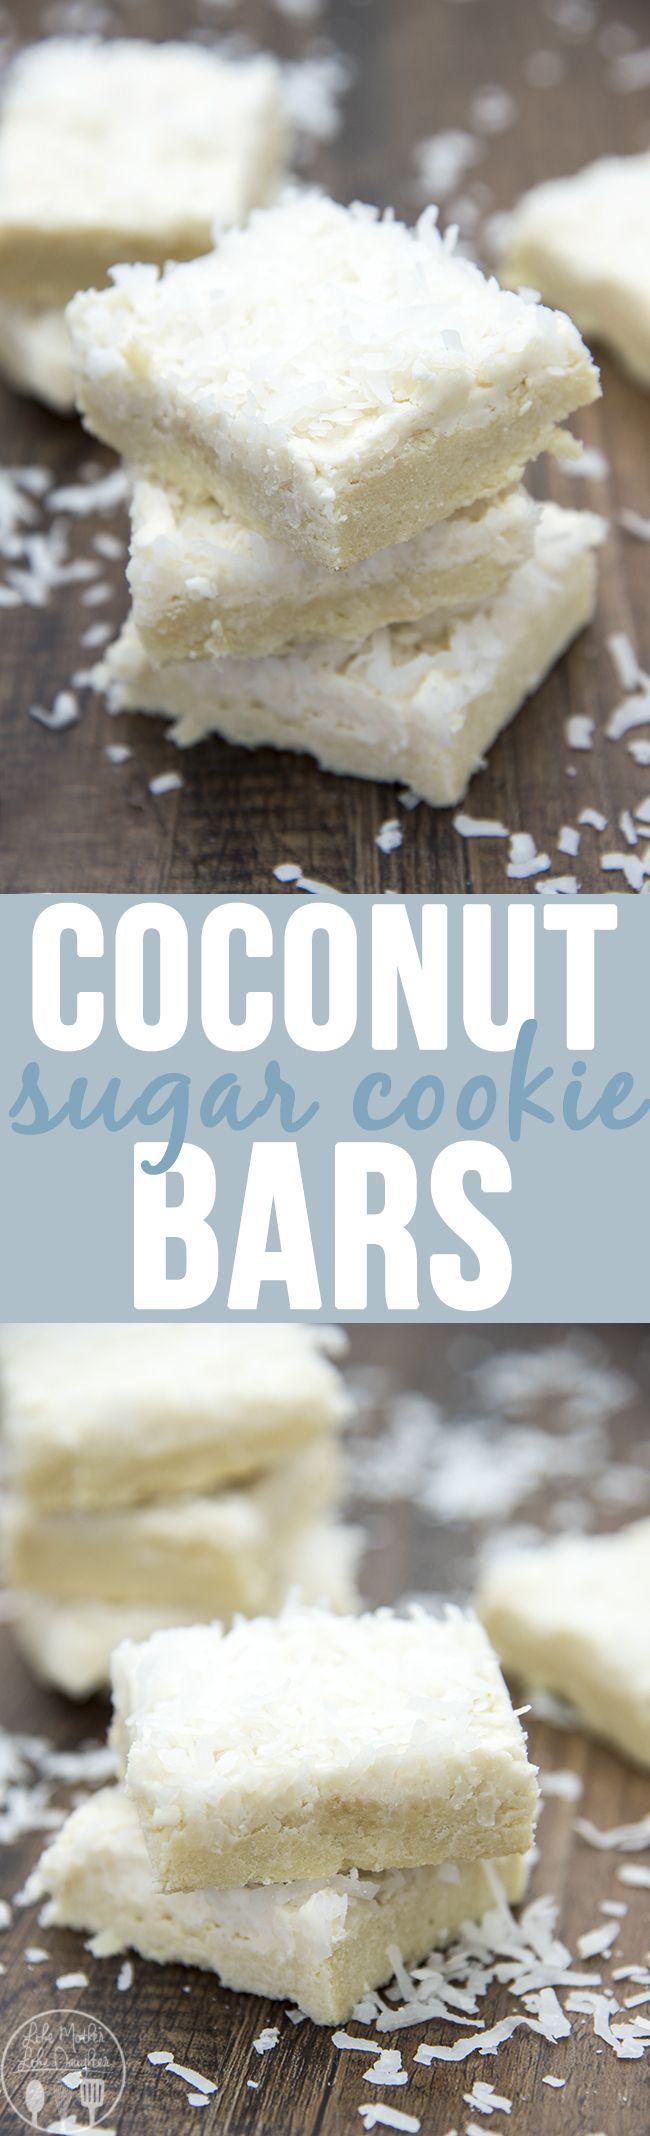 Cake recipe using coconut sugar